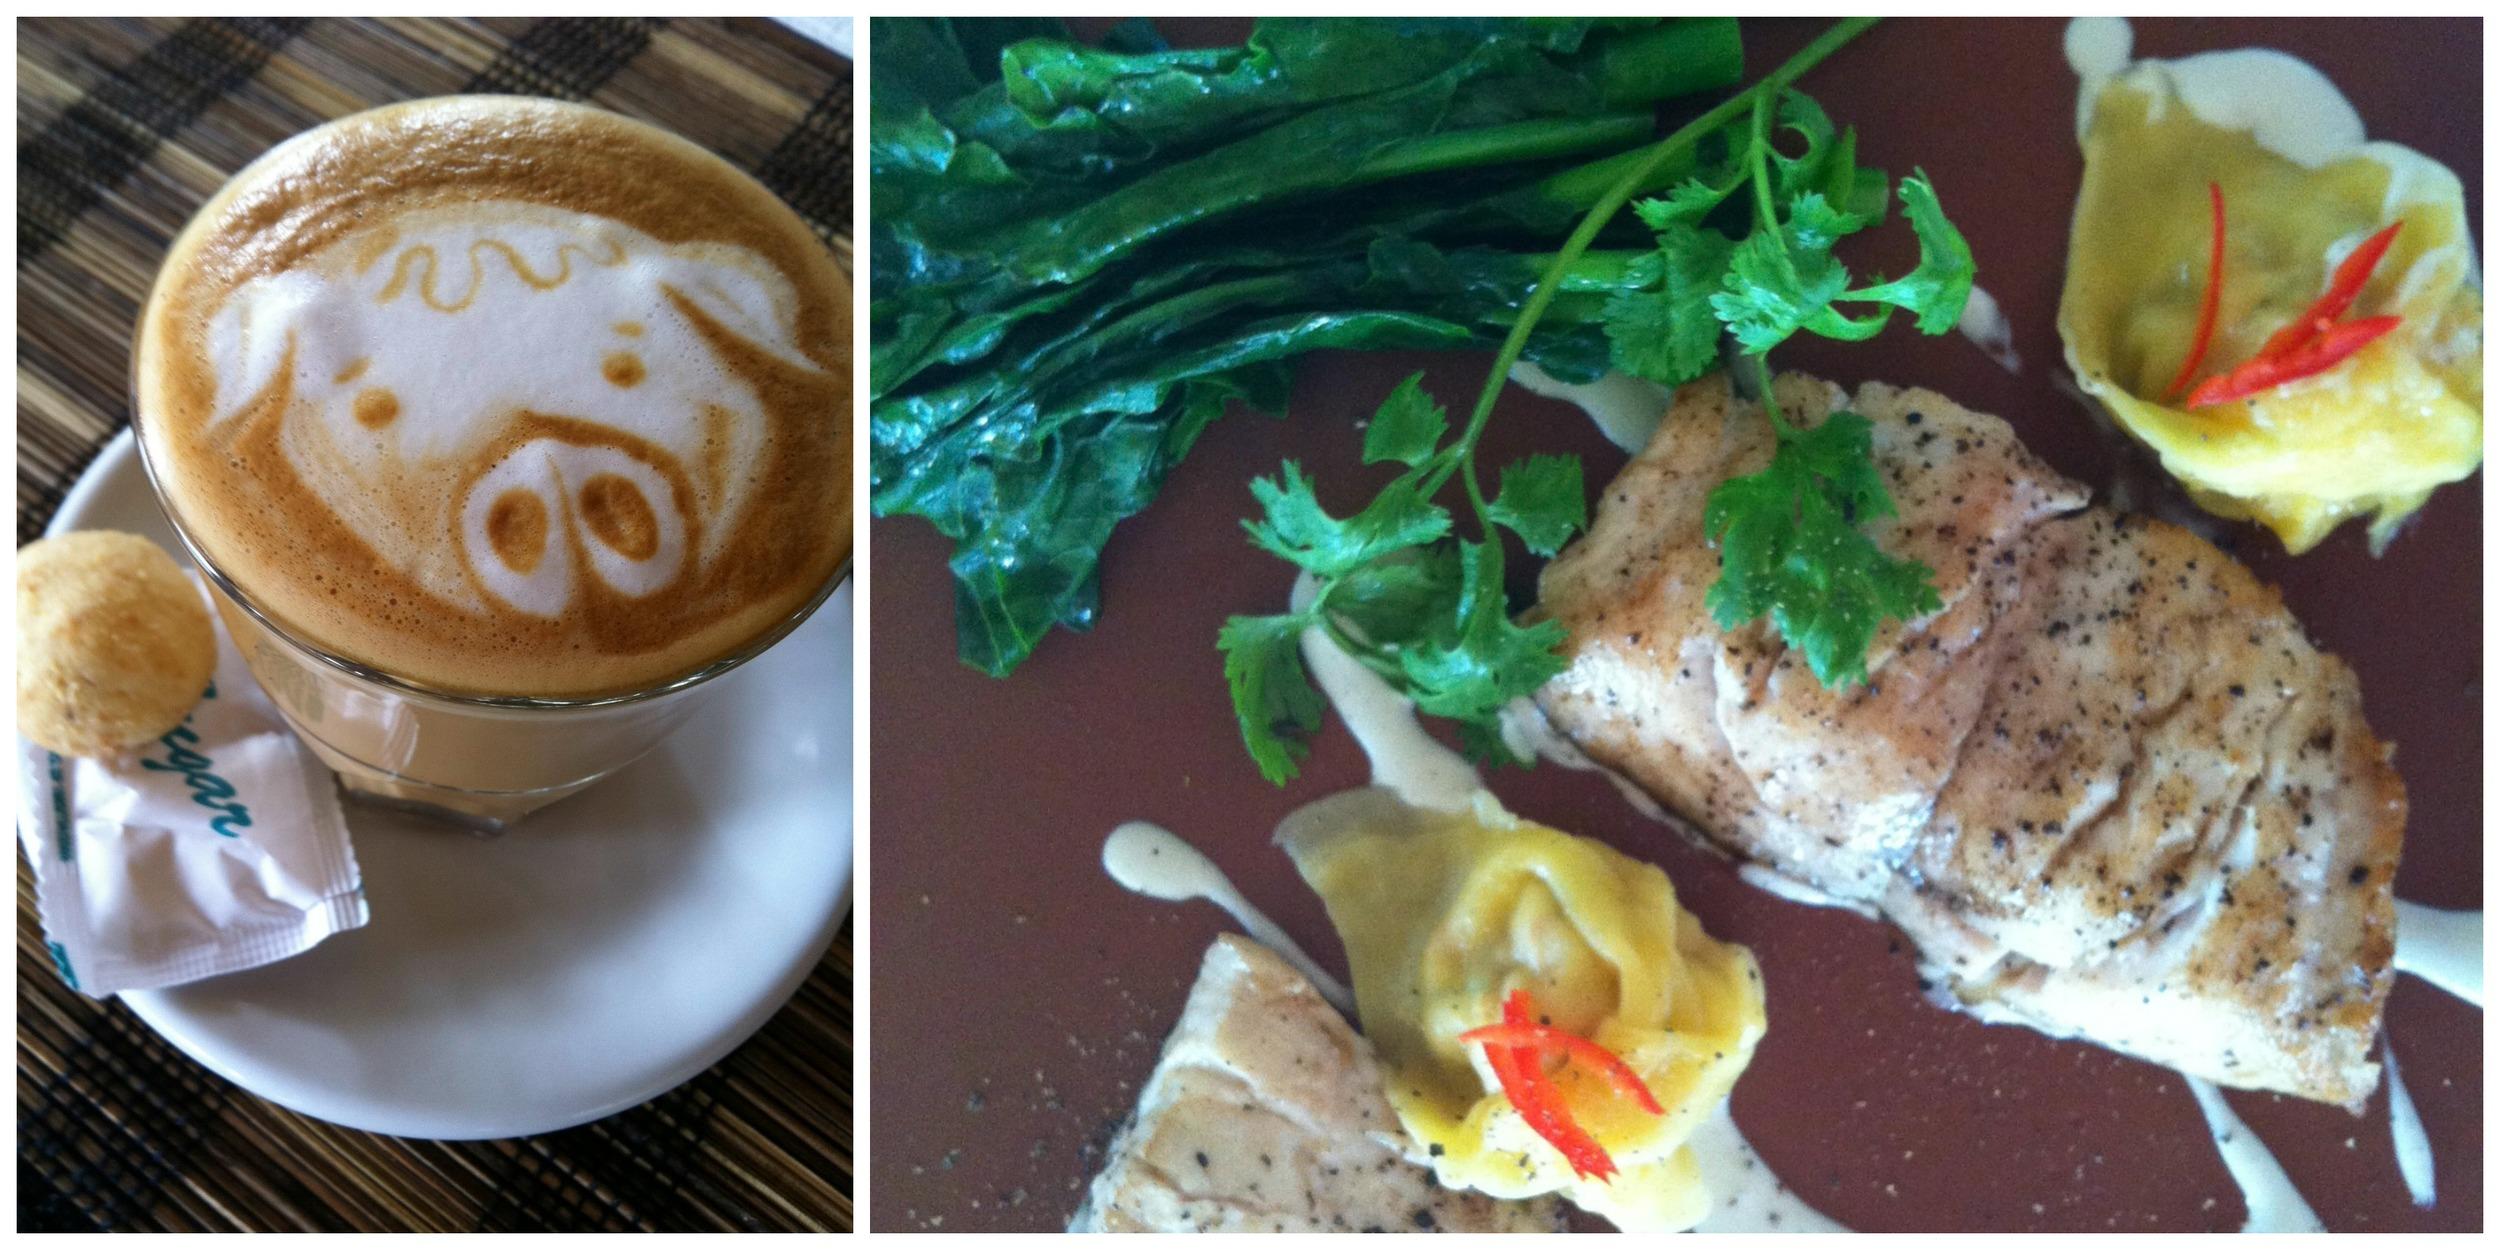 balinese food and coffee.jpg